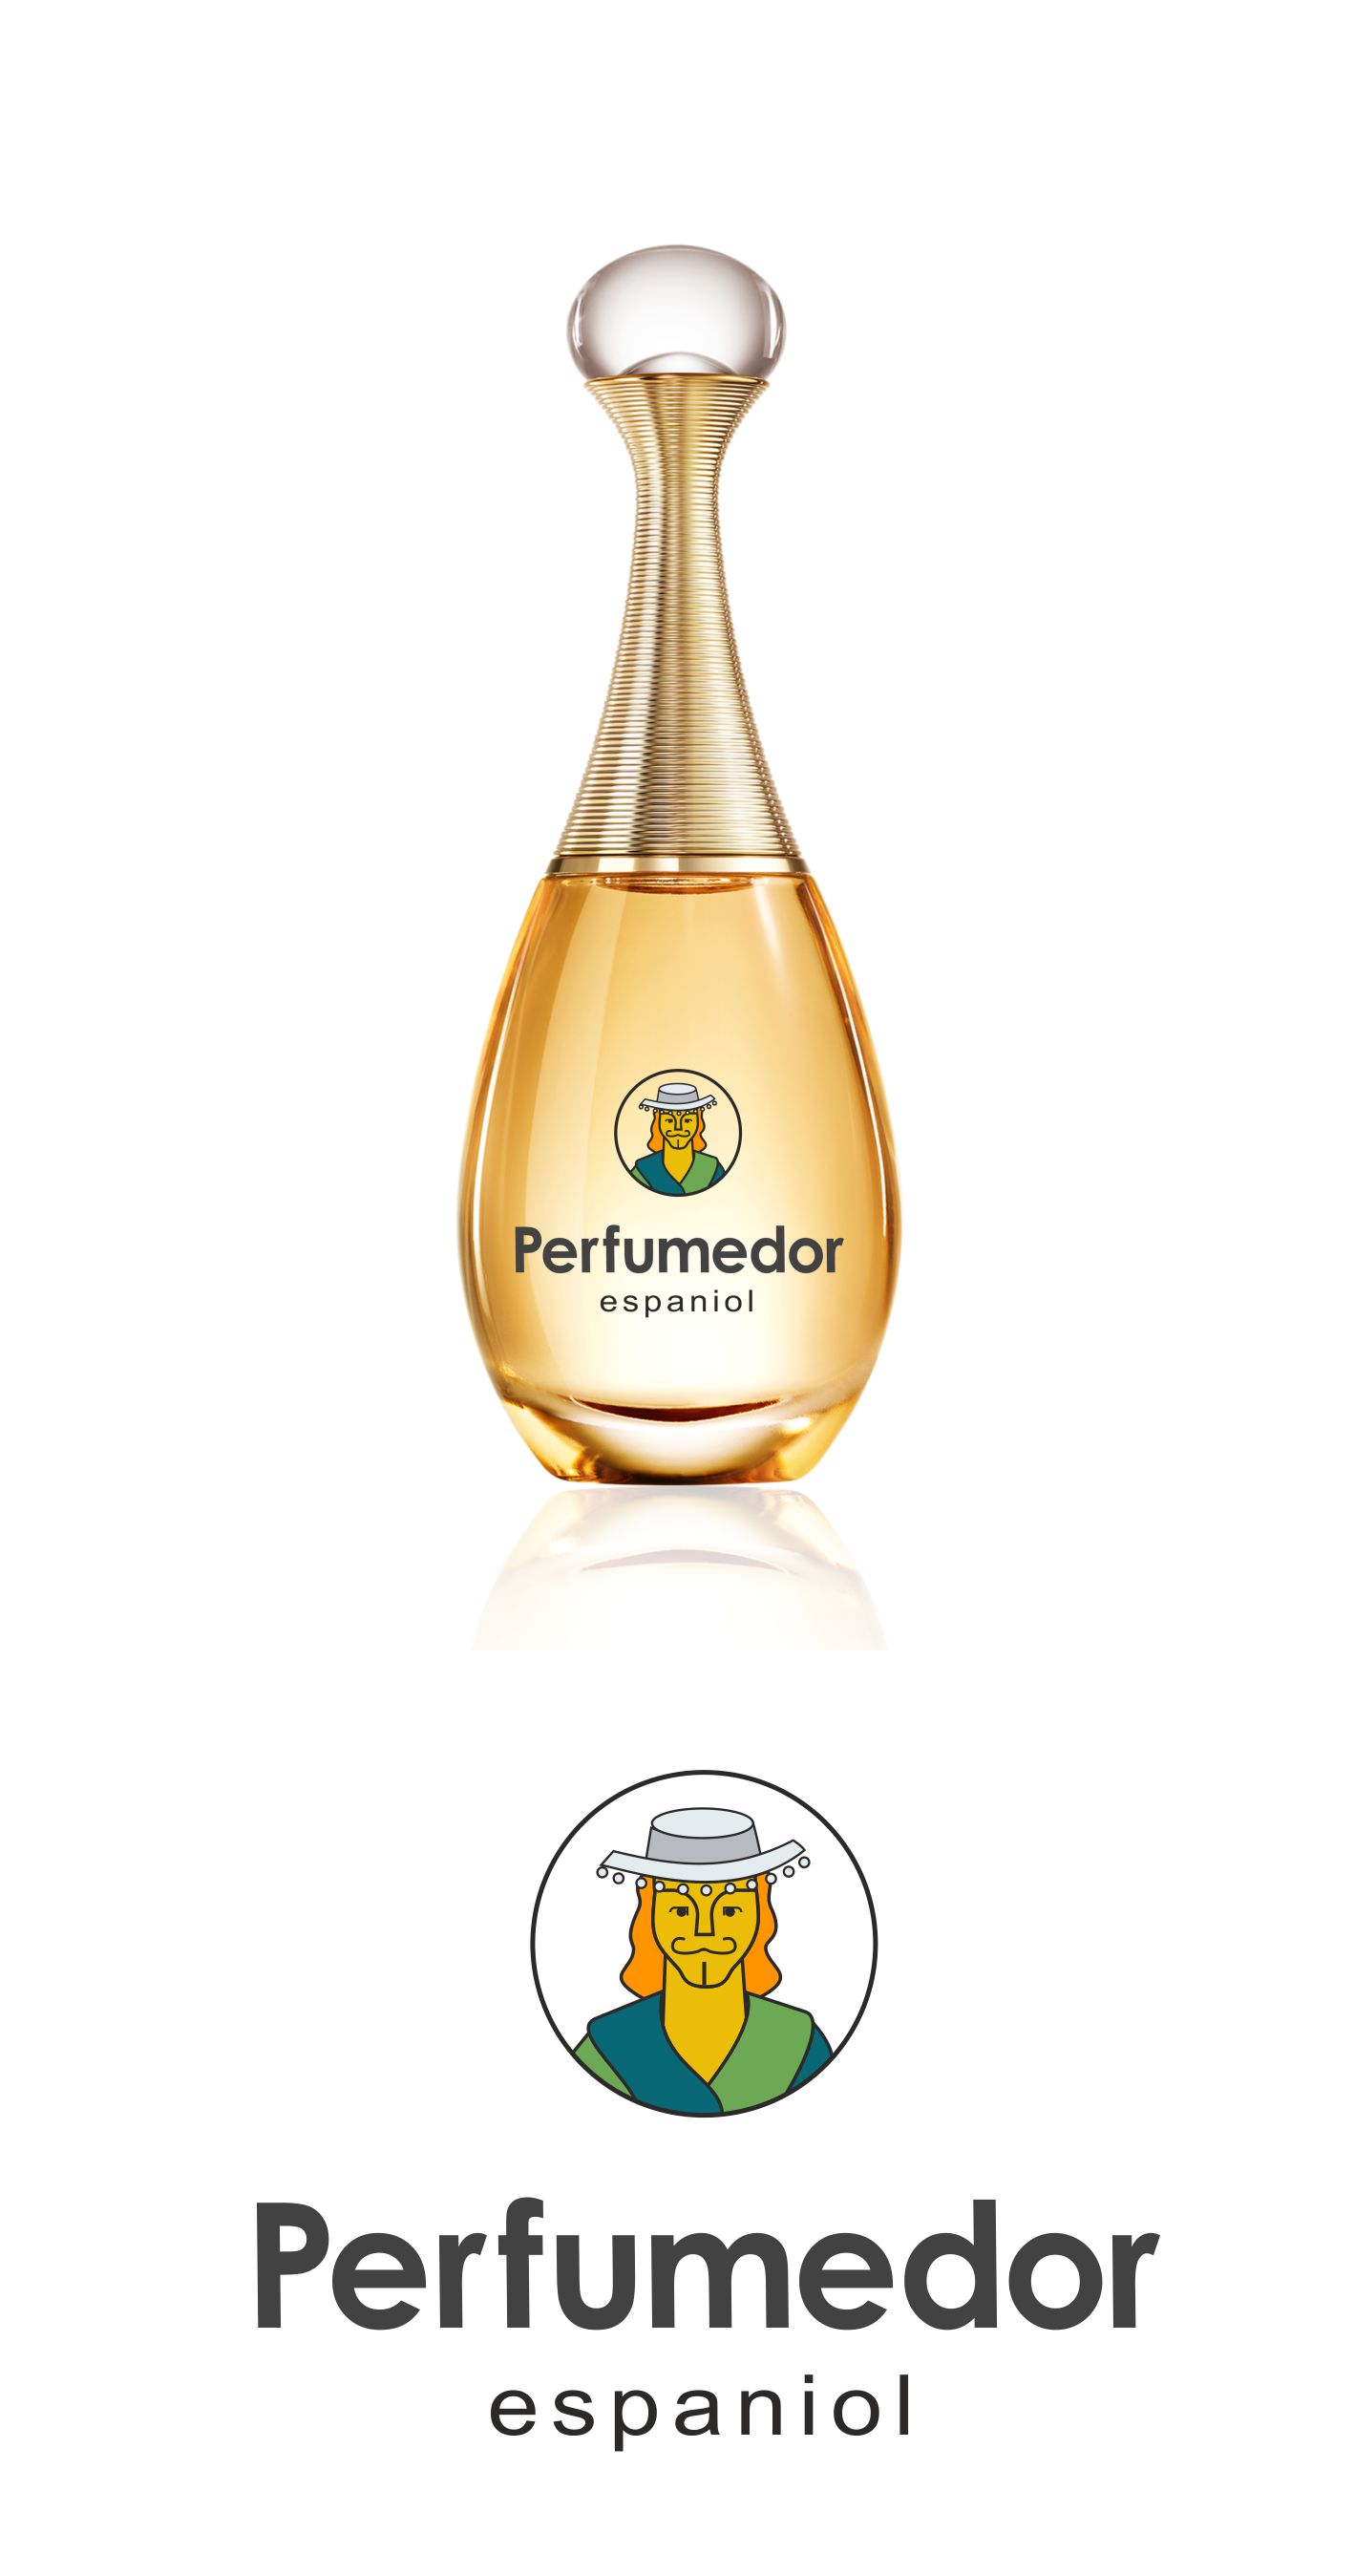 Логотип для интернет-магазина парфюмерии фото f_8665b4764ec69bfb.jpg